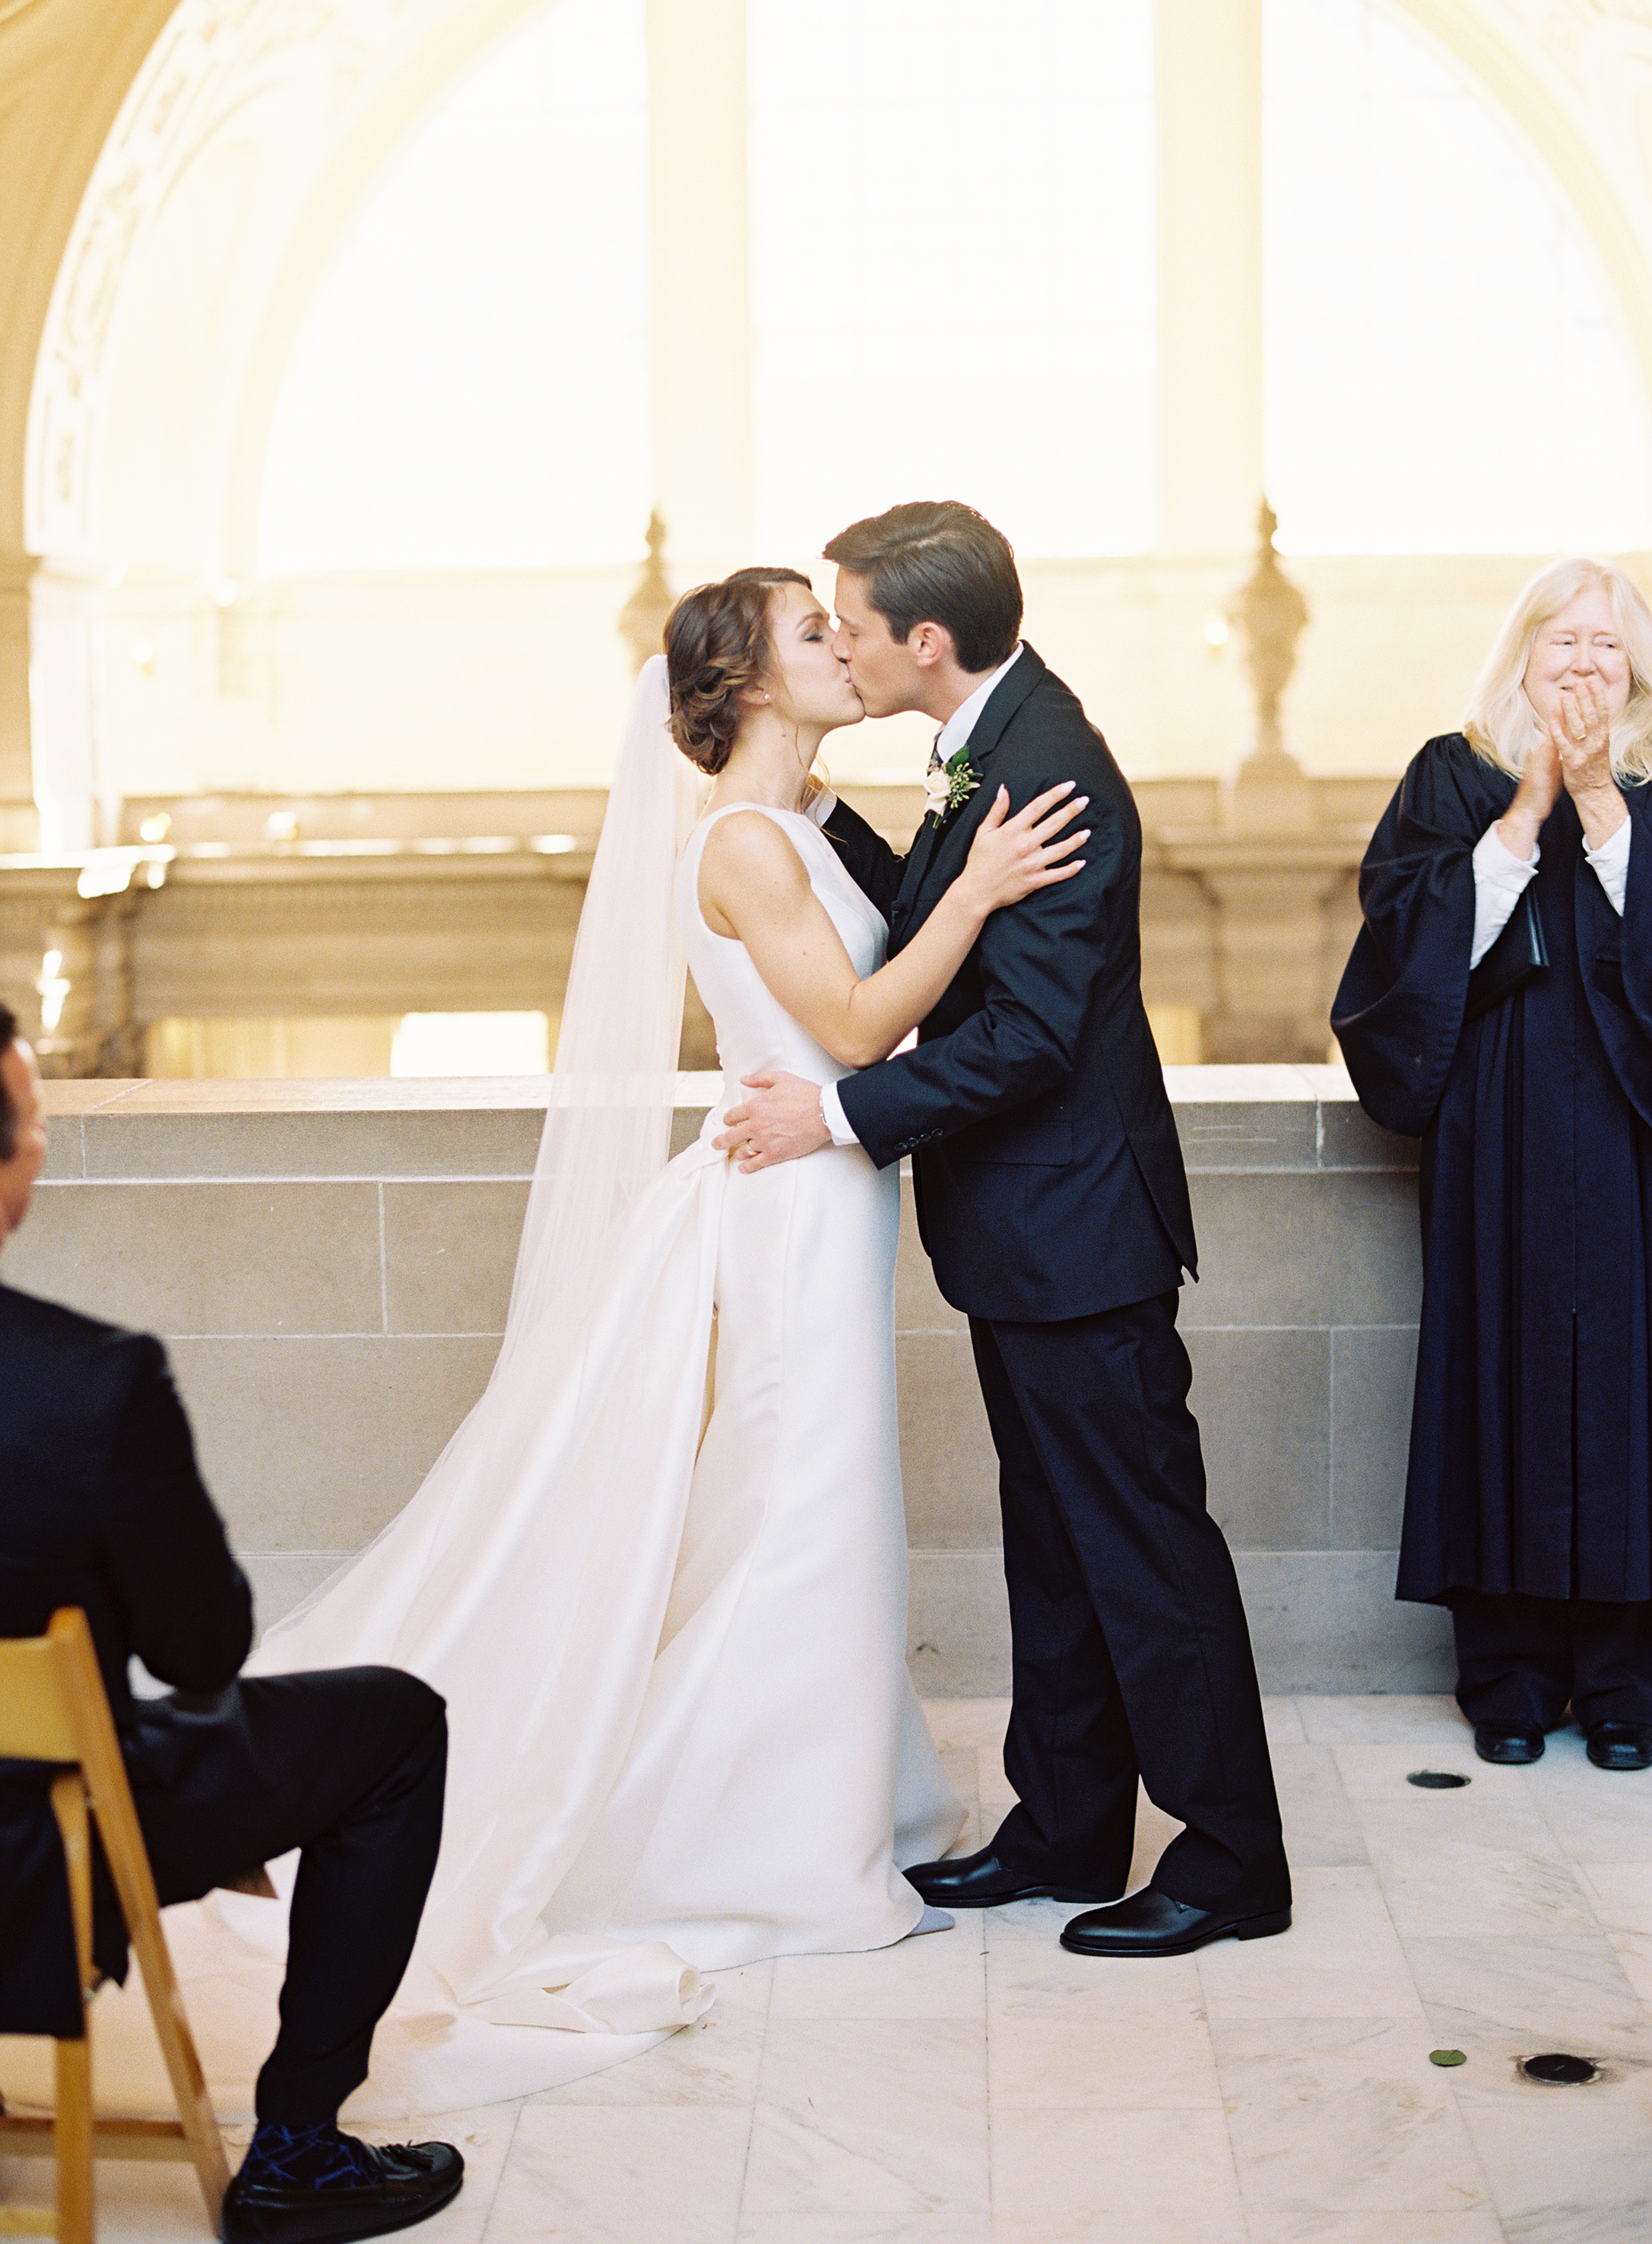 Meghan Mehan Photography - California Wedding Photographer | San Francisco City Hall Wedding 100.jpg